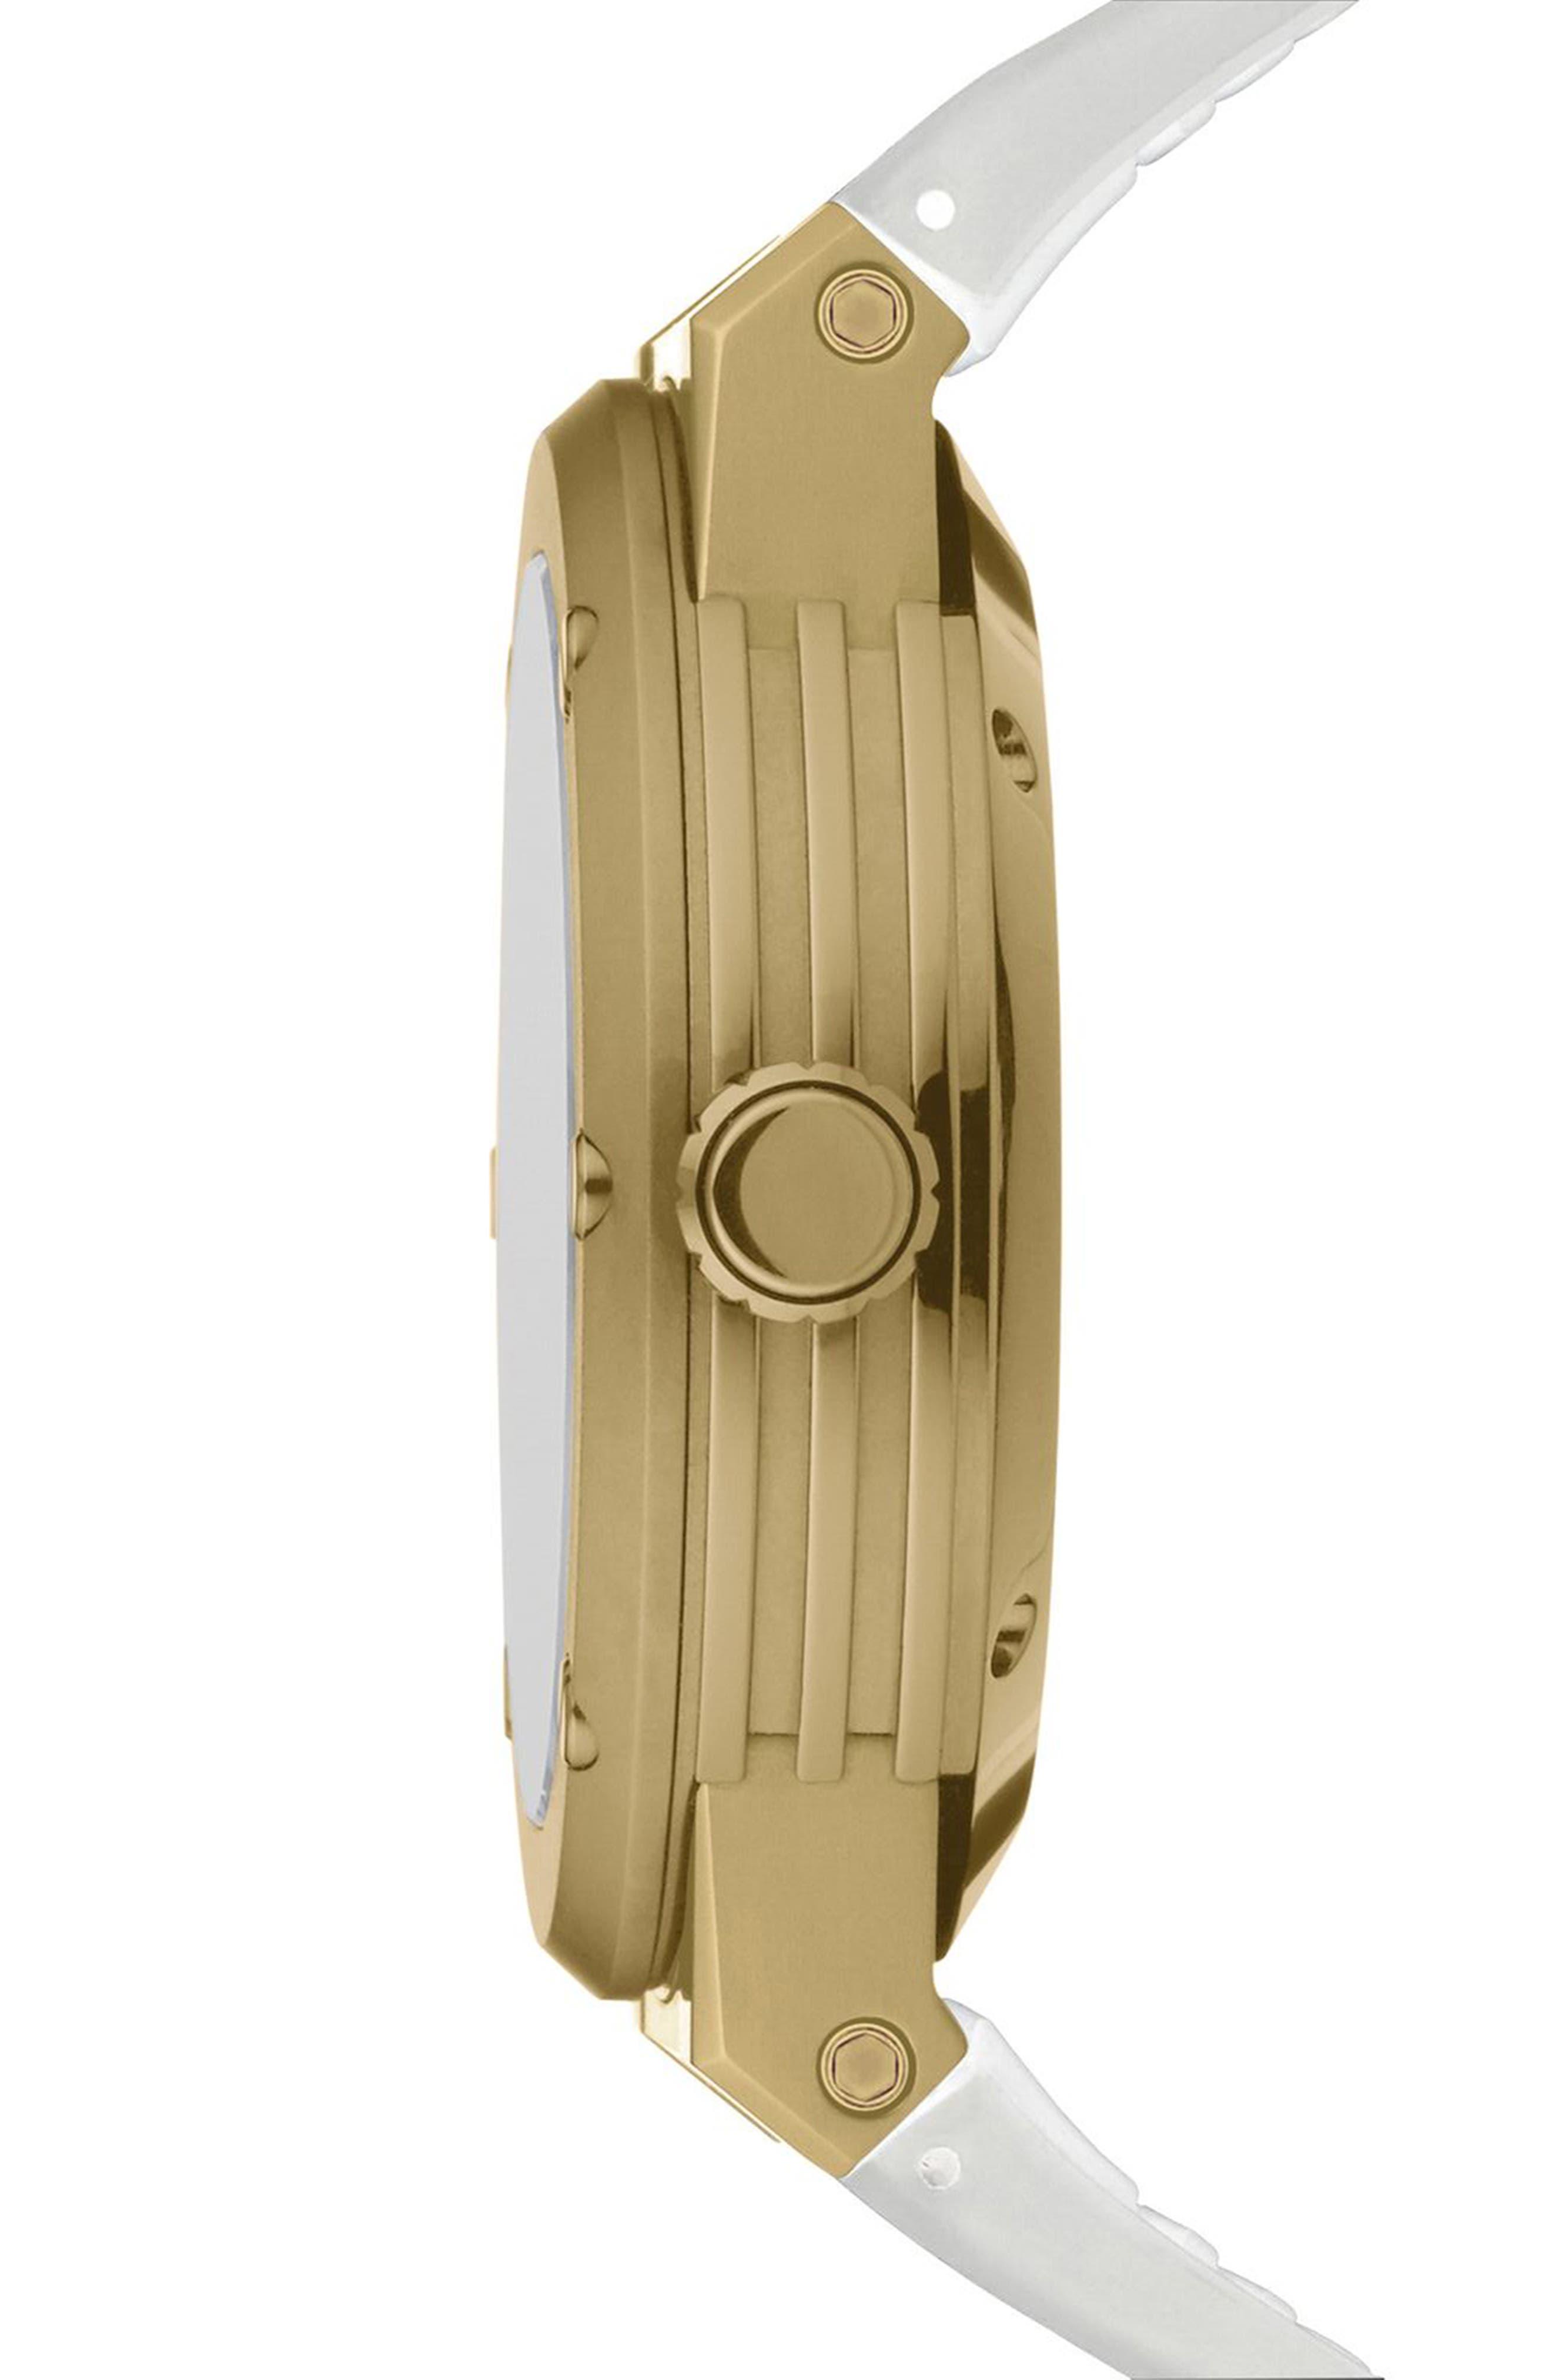 SALVATORE FERRAGAMO, F-80 Motion Rubber Strap Smart Watch, 44mm, Alternate thumbnail 2, color, WHITE/ MOP/ GOLD